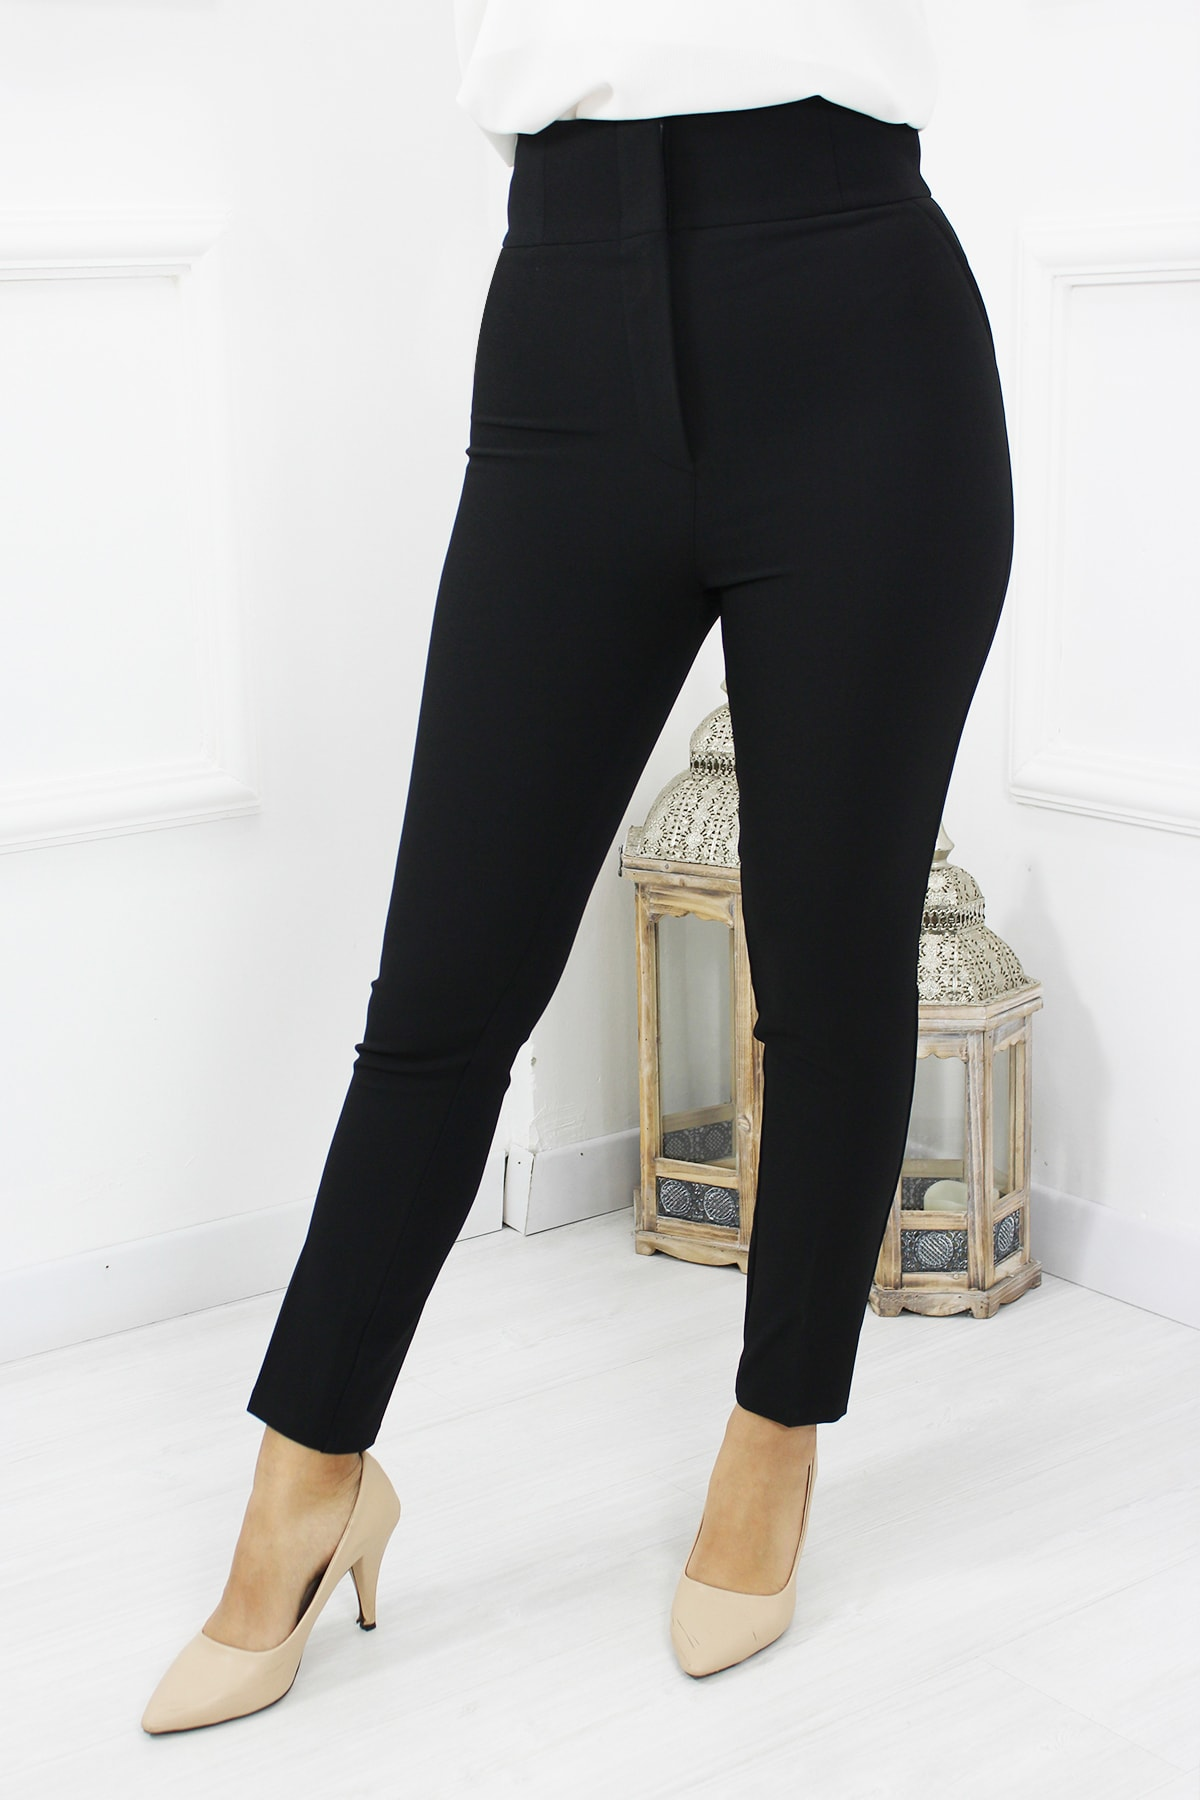 UGİMPOL Yüksek Bel Kumaş Pantolon 2